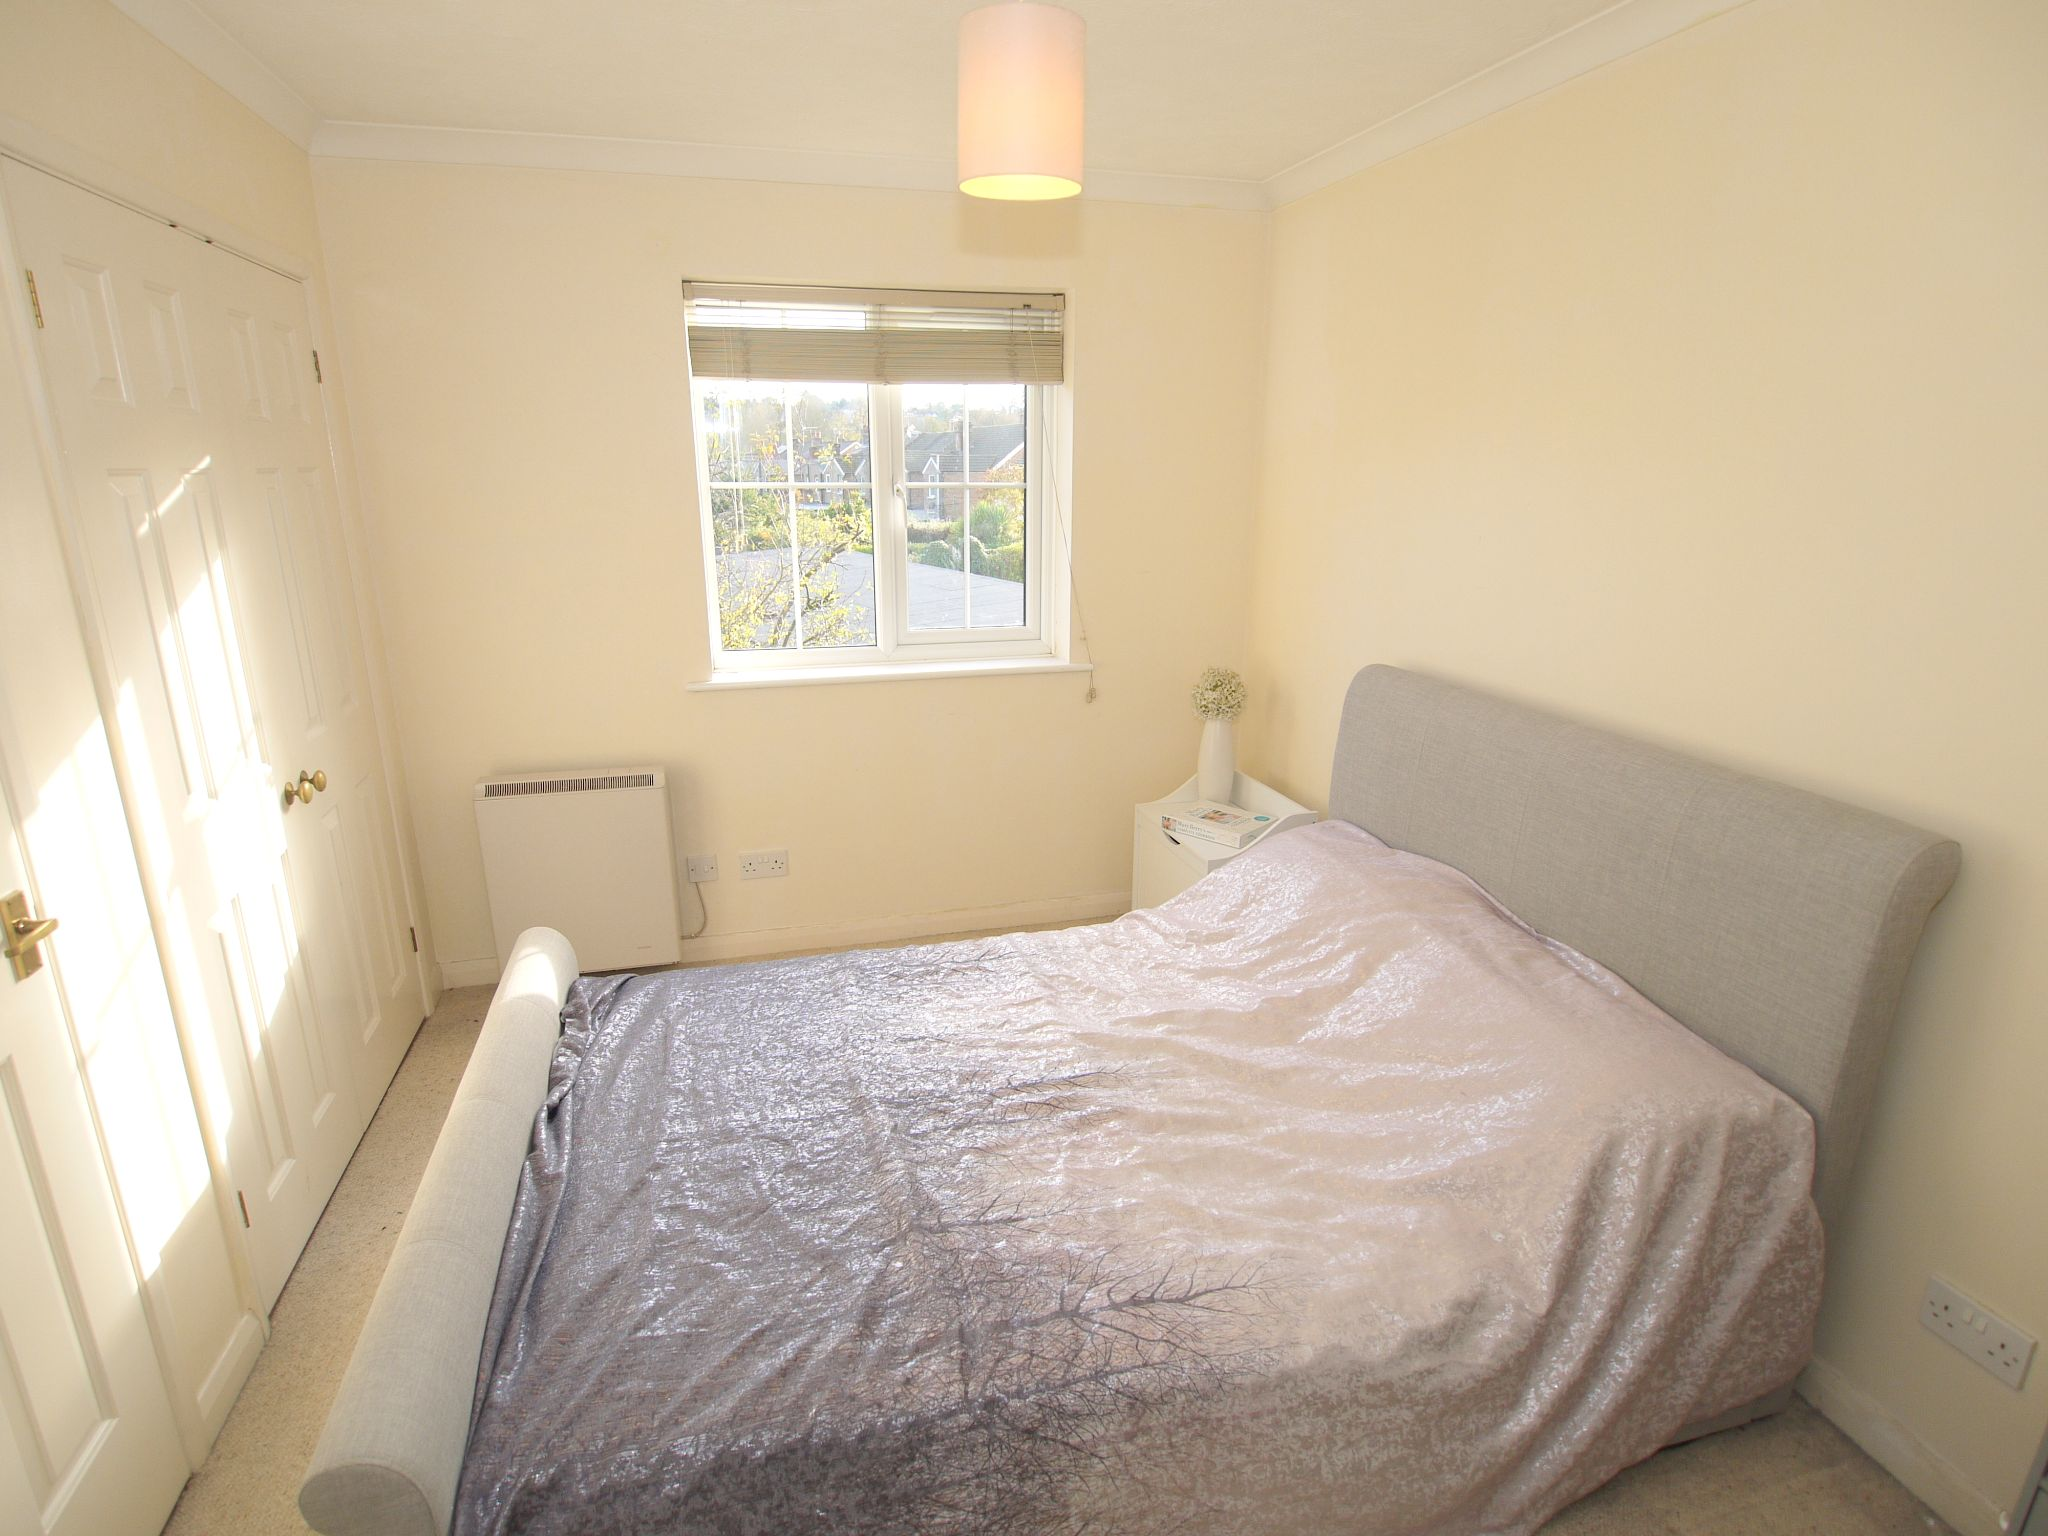 1 bedroom flat Sold in Sevenoaks - Photograph 4